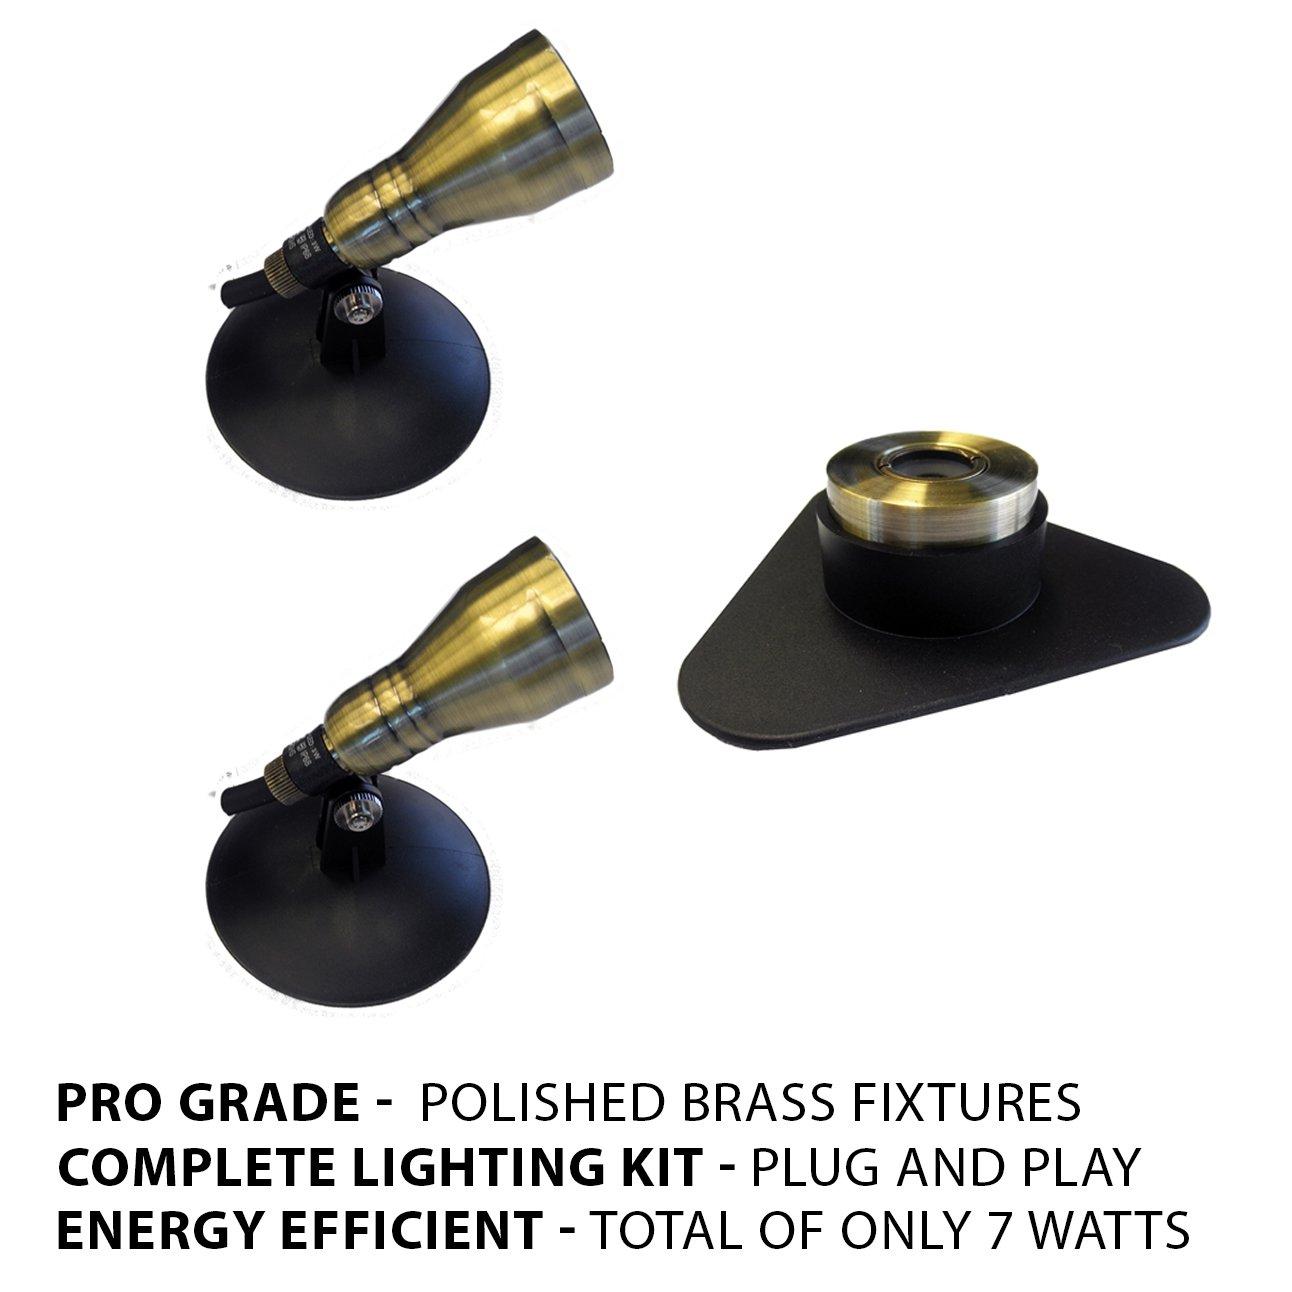 Patriot Brass LED Waterproof Pond and Landscape Lighting 7 Watt Light Kit P-A3